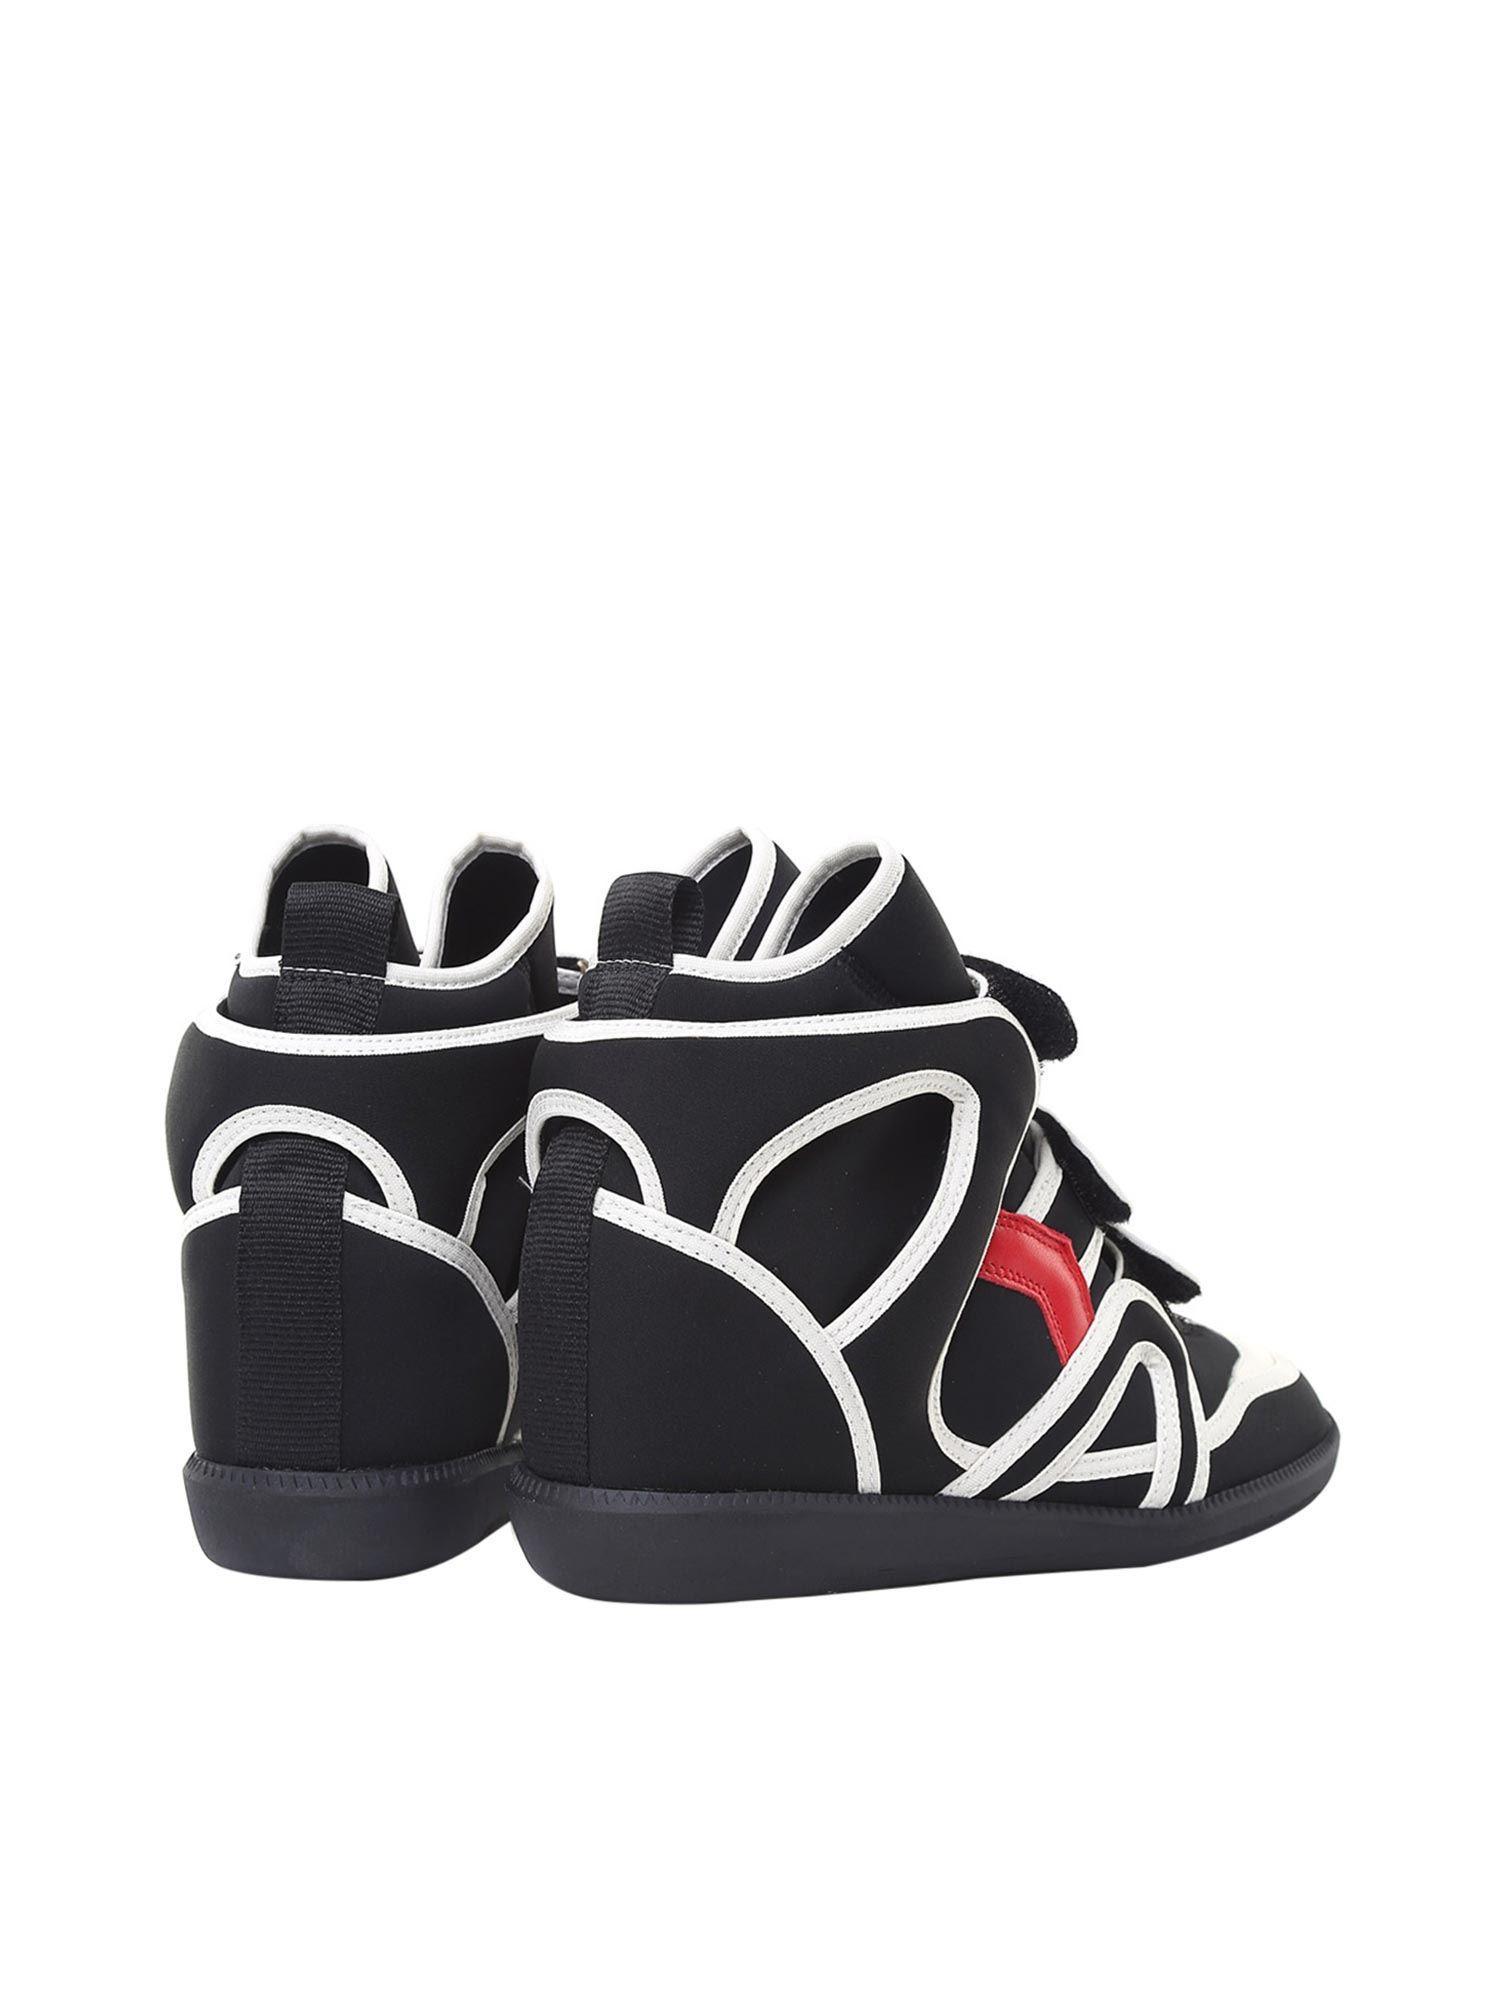 Isabel Marant Neoprene Buckee Wedge Sneakers